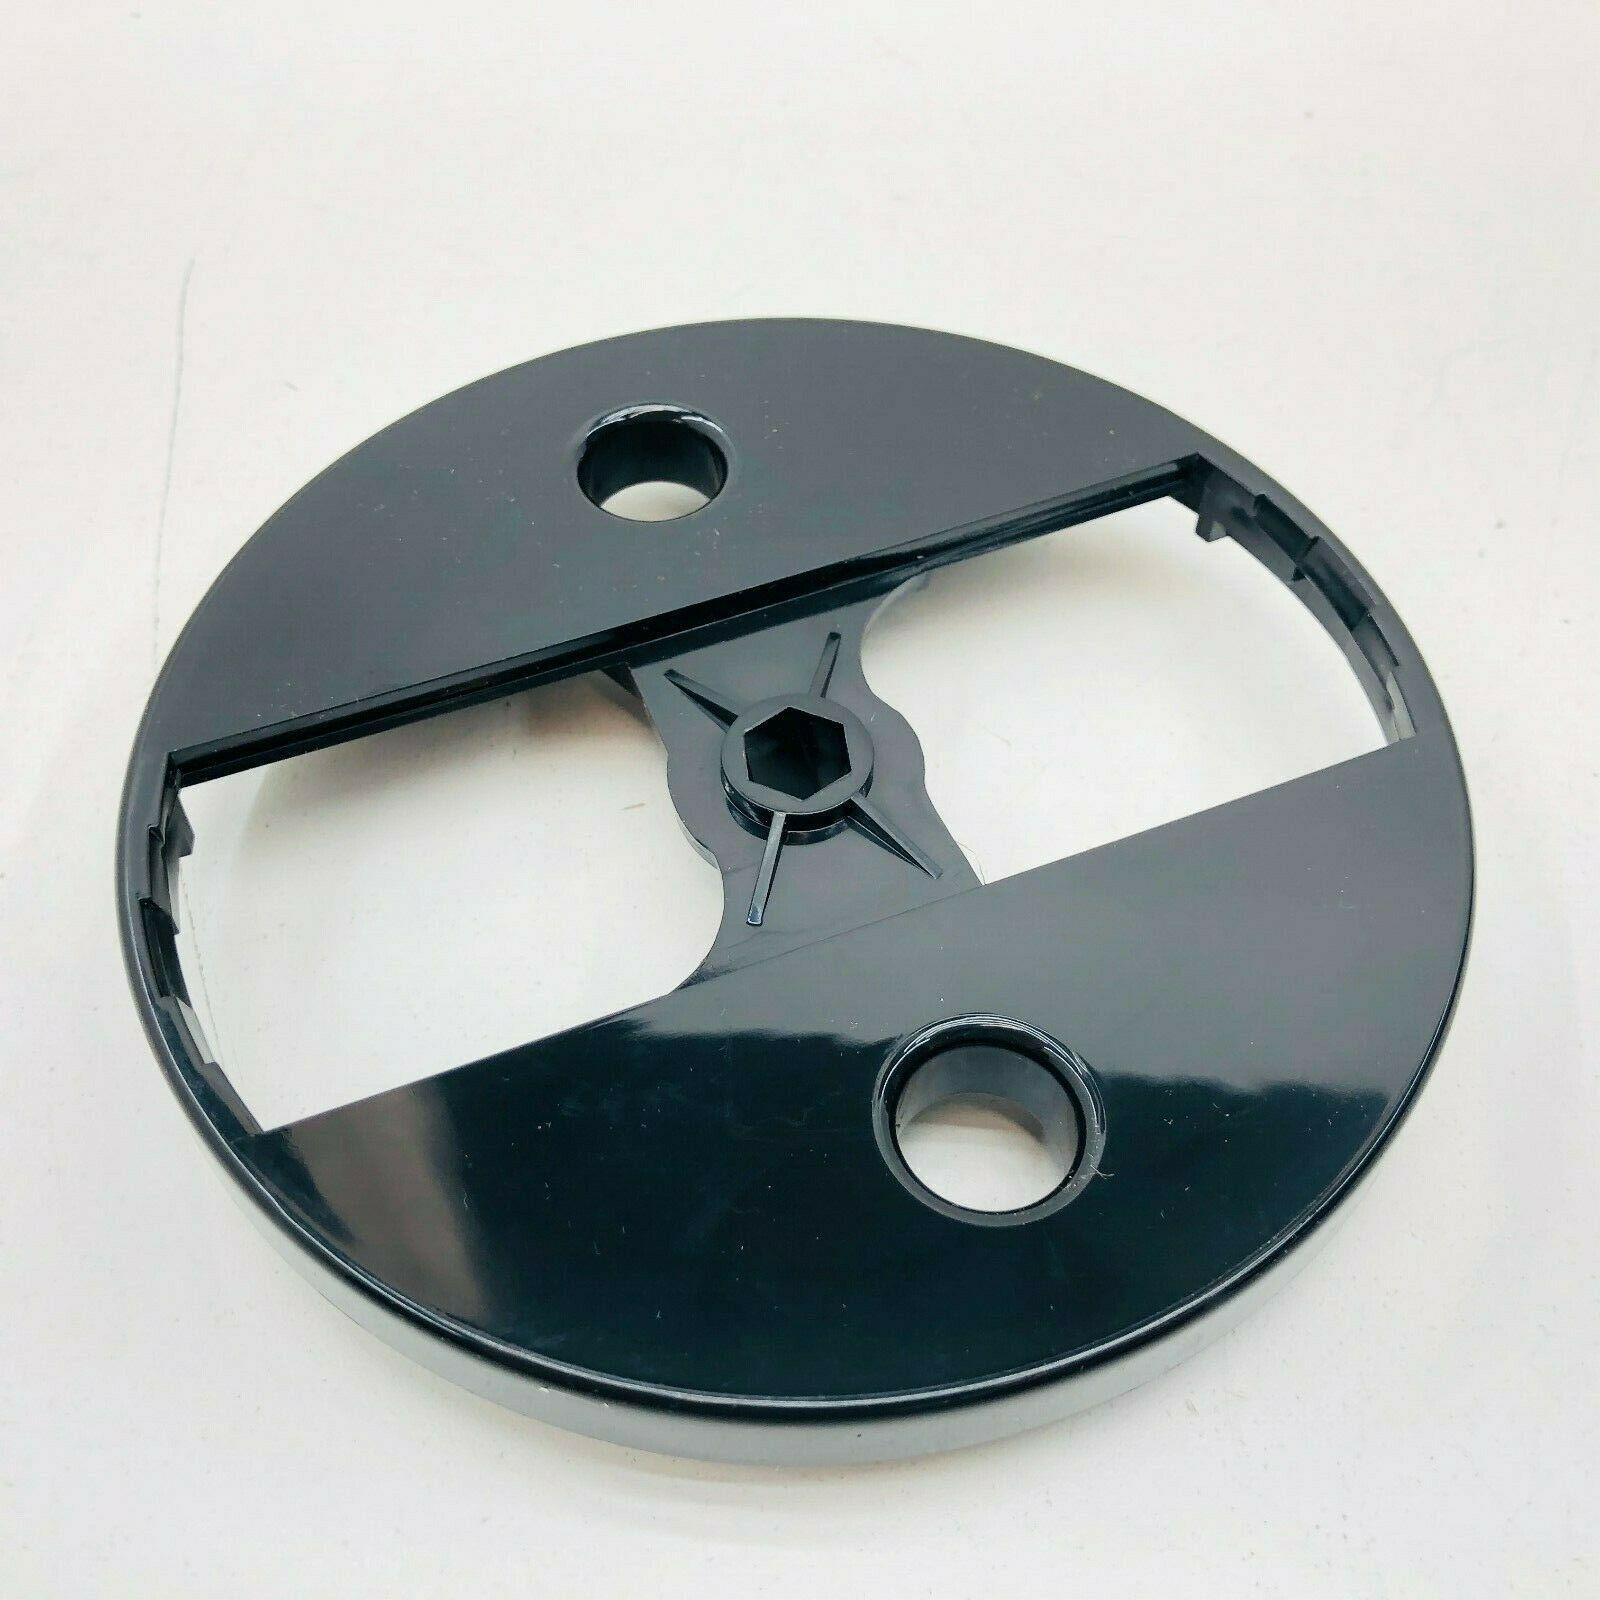 Bravetti Platinum Pro Food Processor EP90 Blade Holder Carrier Replacement Part - $17.89